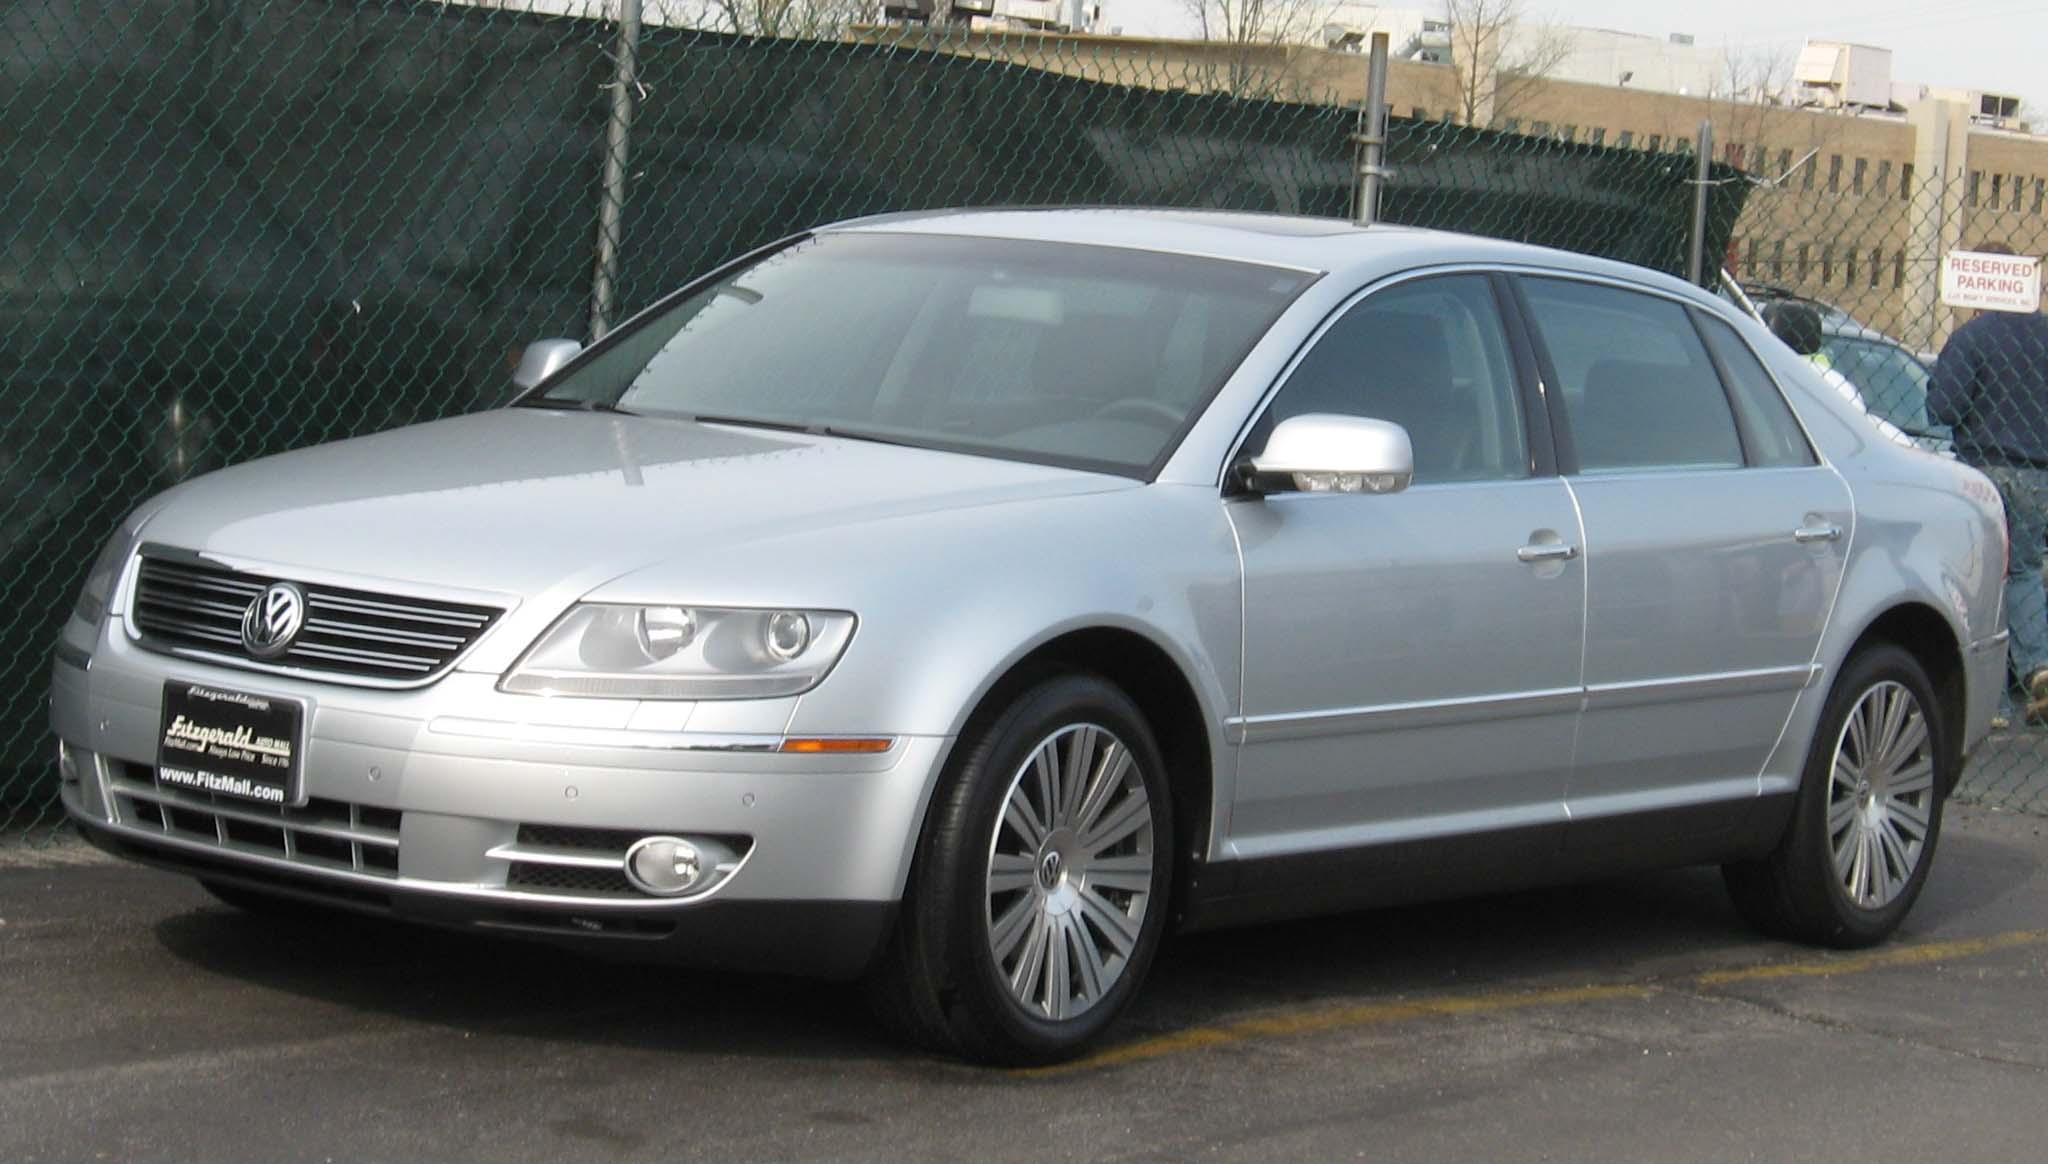 "18"" RIMS ALLOY WHEELS FITS VW VOLKSWAGEN PASSAT PHAETON ... |Volkswagen Phaeton Wheels"